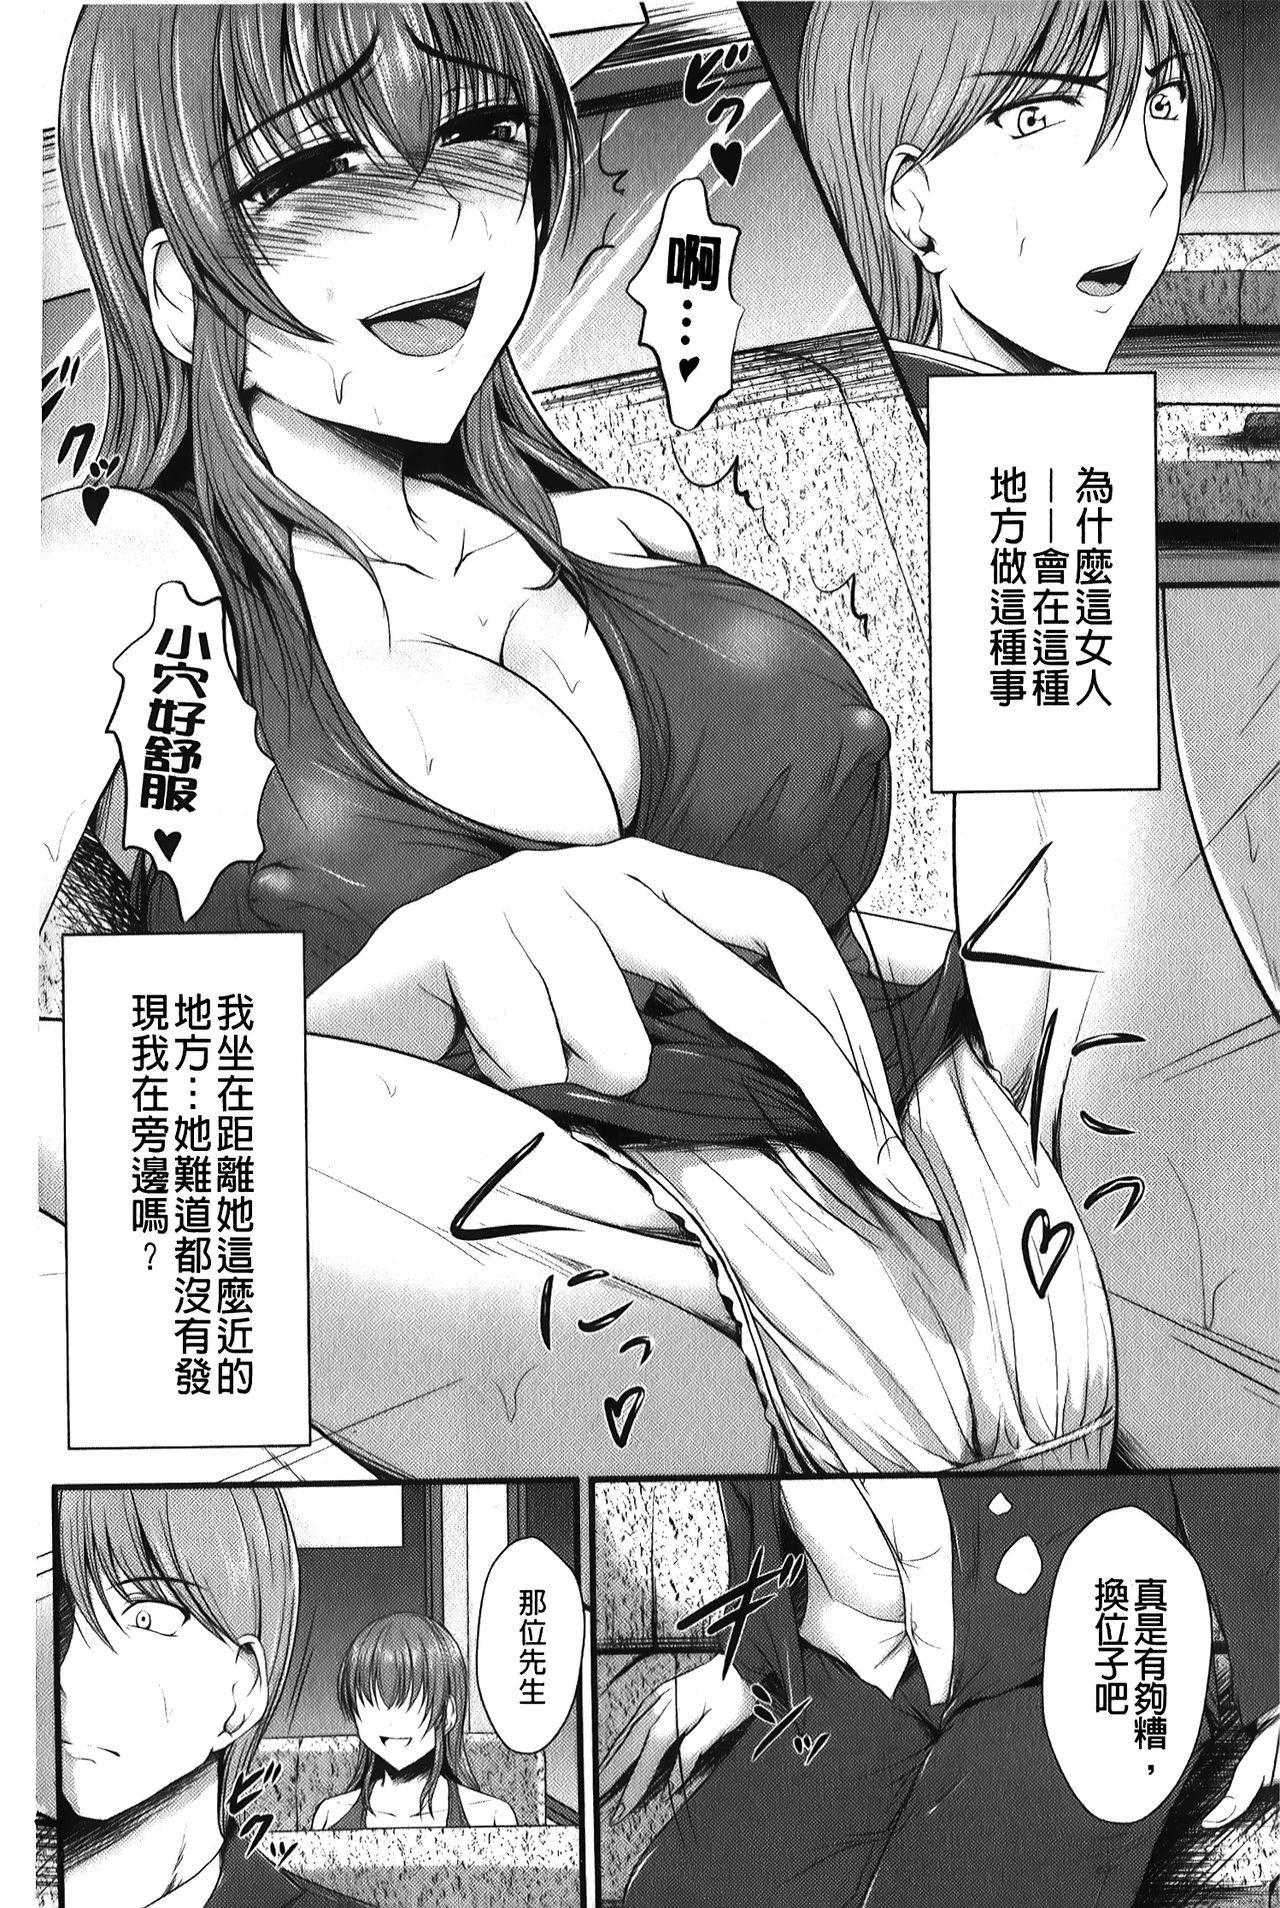 Hameochi | 戳插墮落 4